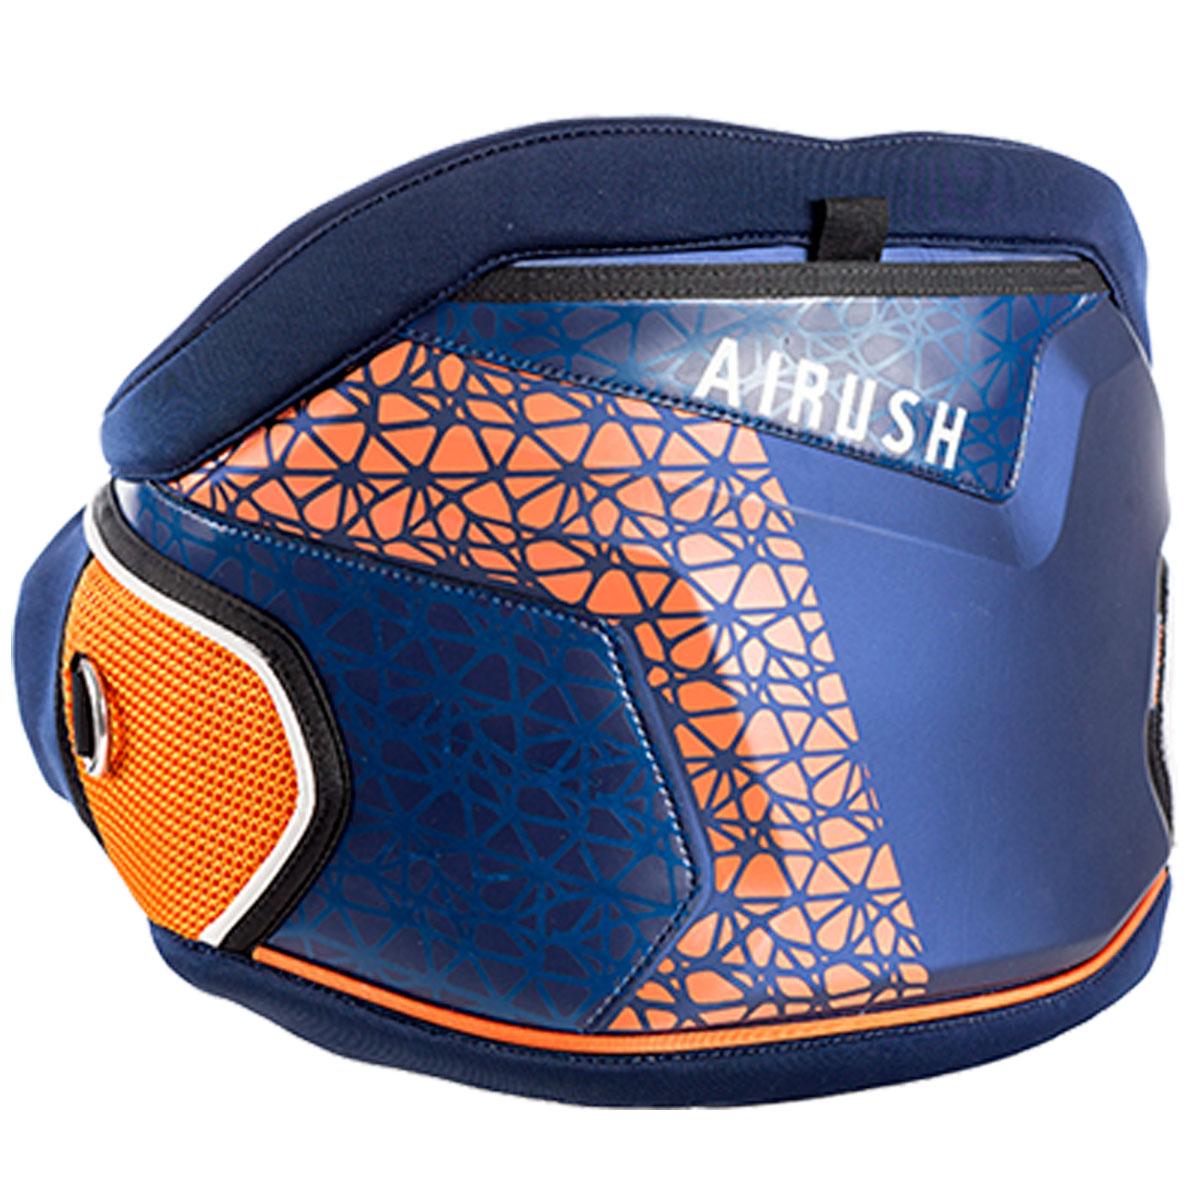 Airush-Core-Harness_111093A.jpg